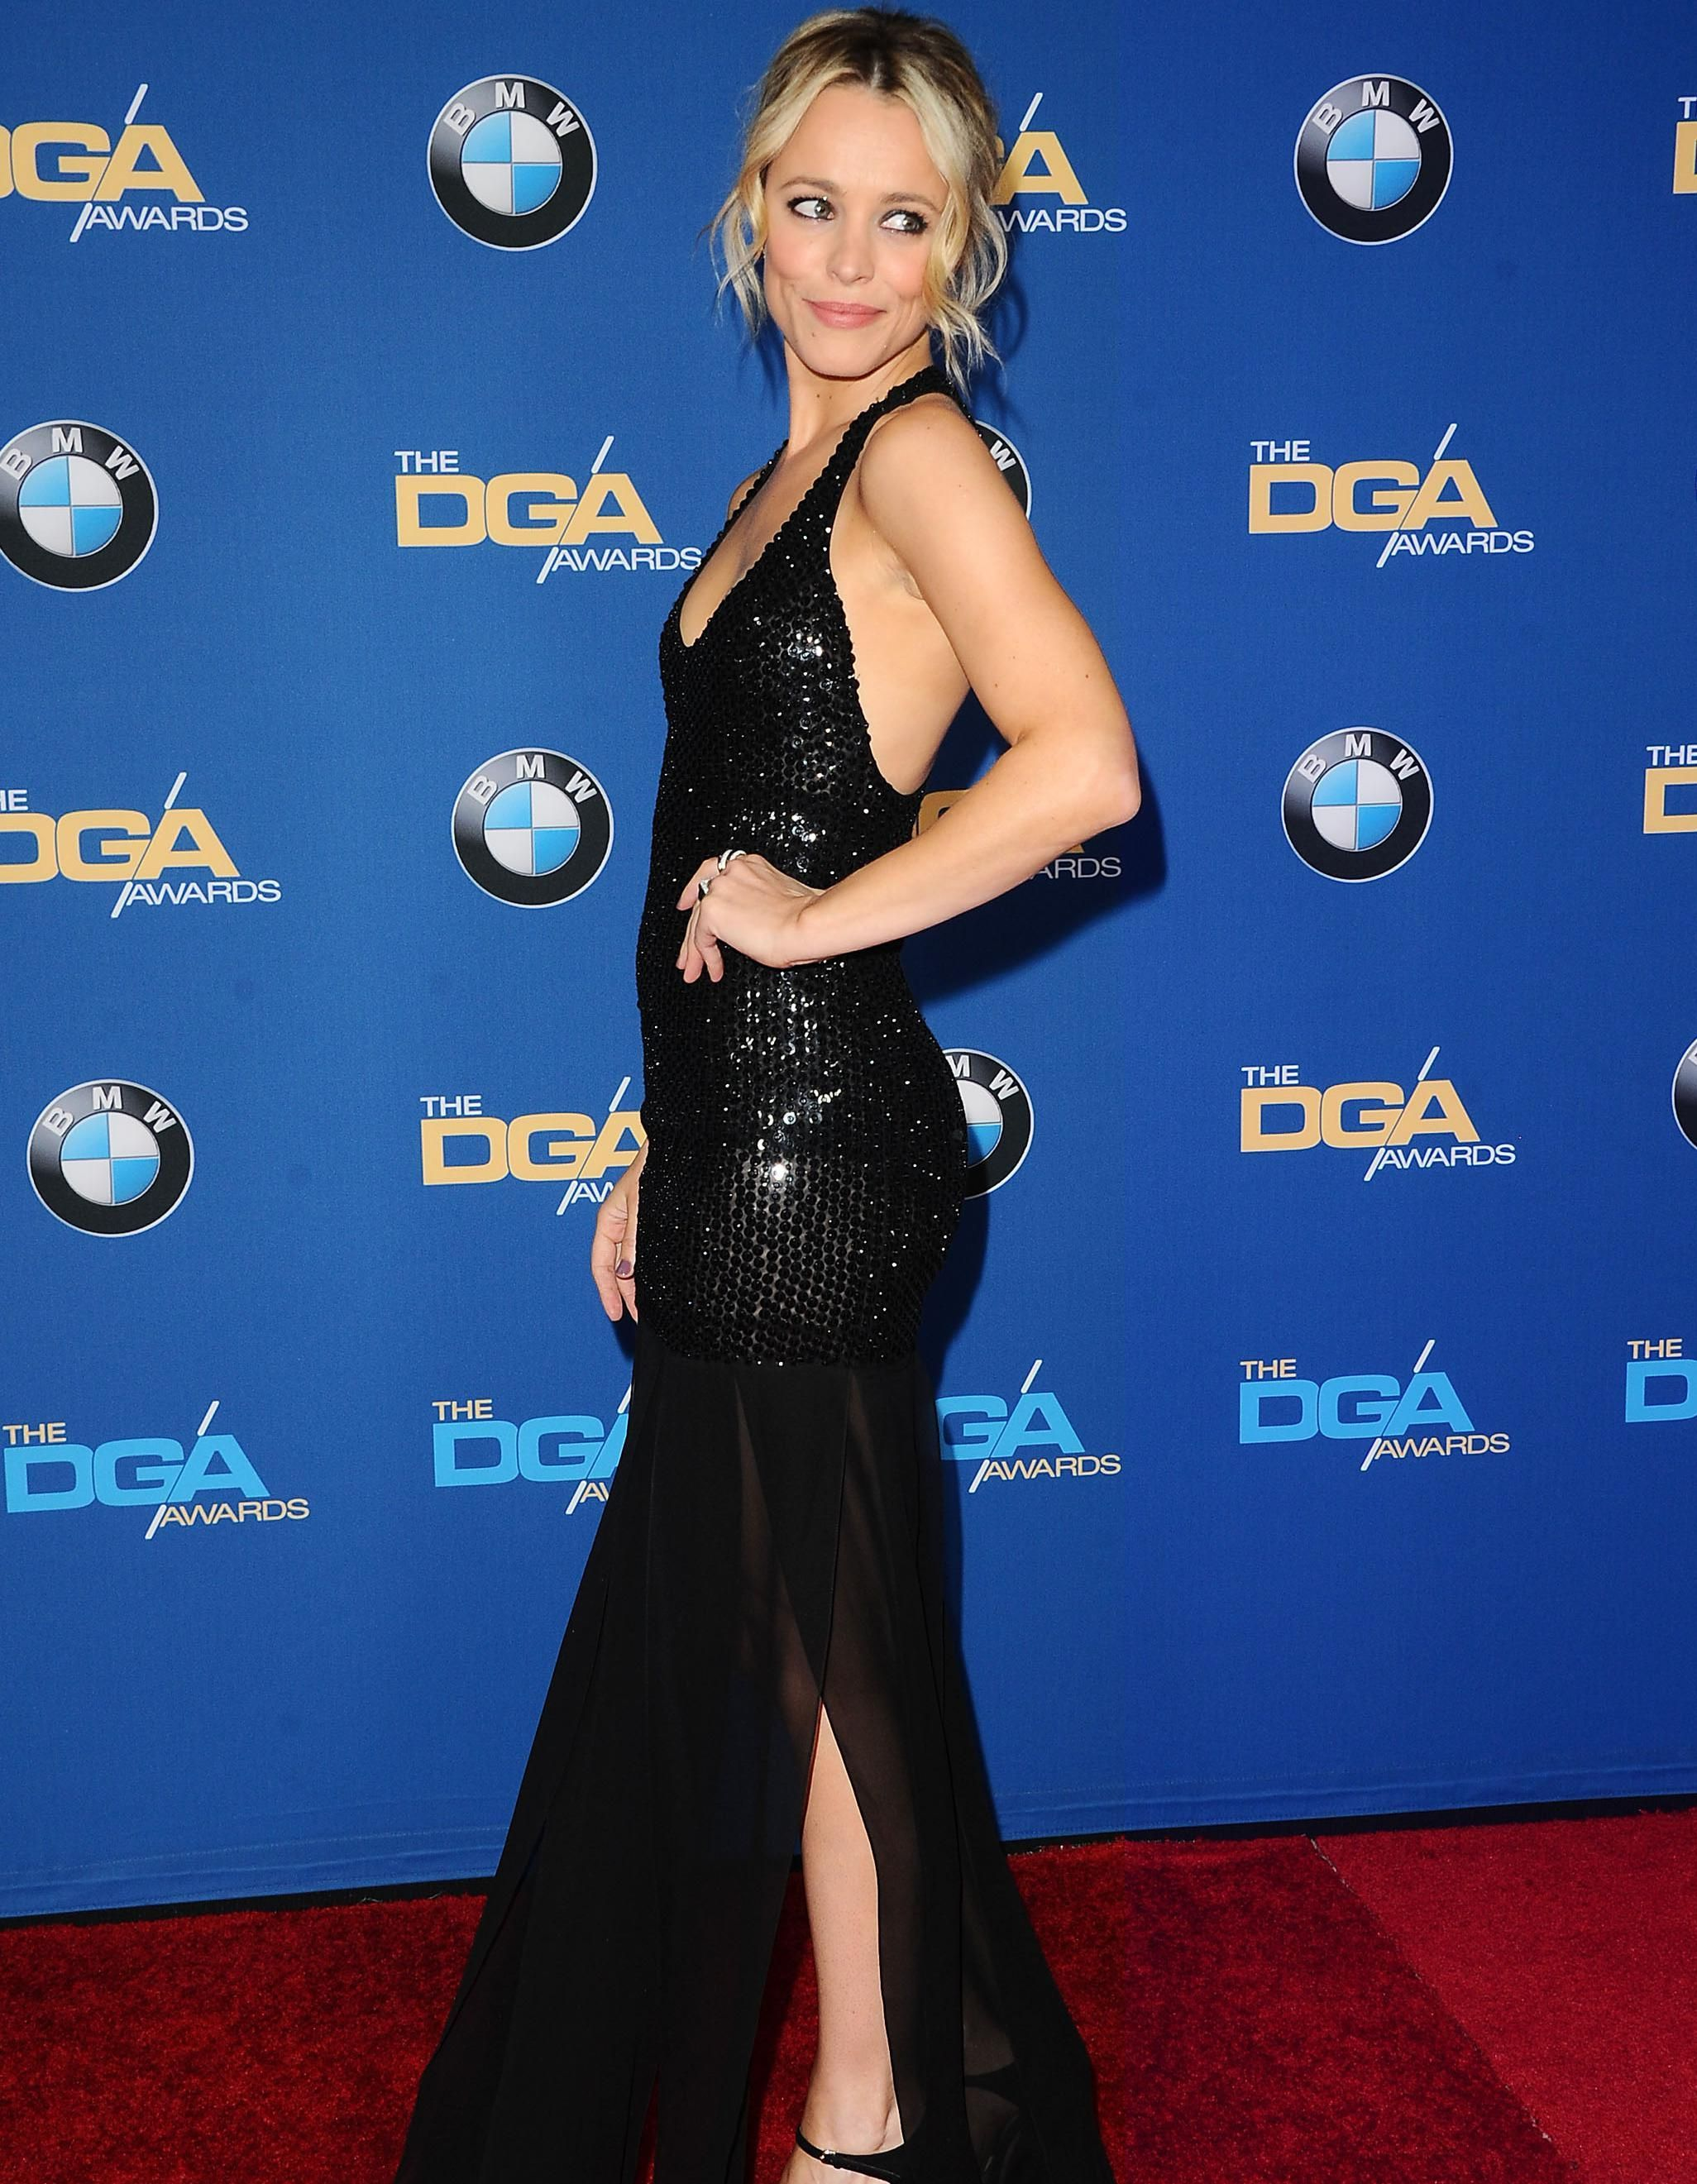 Rachel McAdams, Ryan Gosling, Leonardo DiCaprio : le red carpet prestigieux des Director's Guild Awards